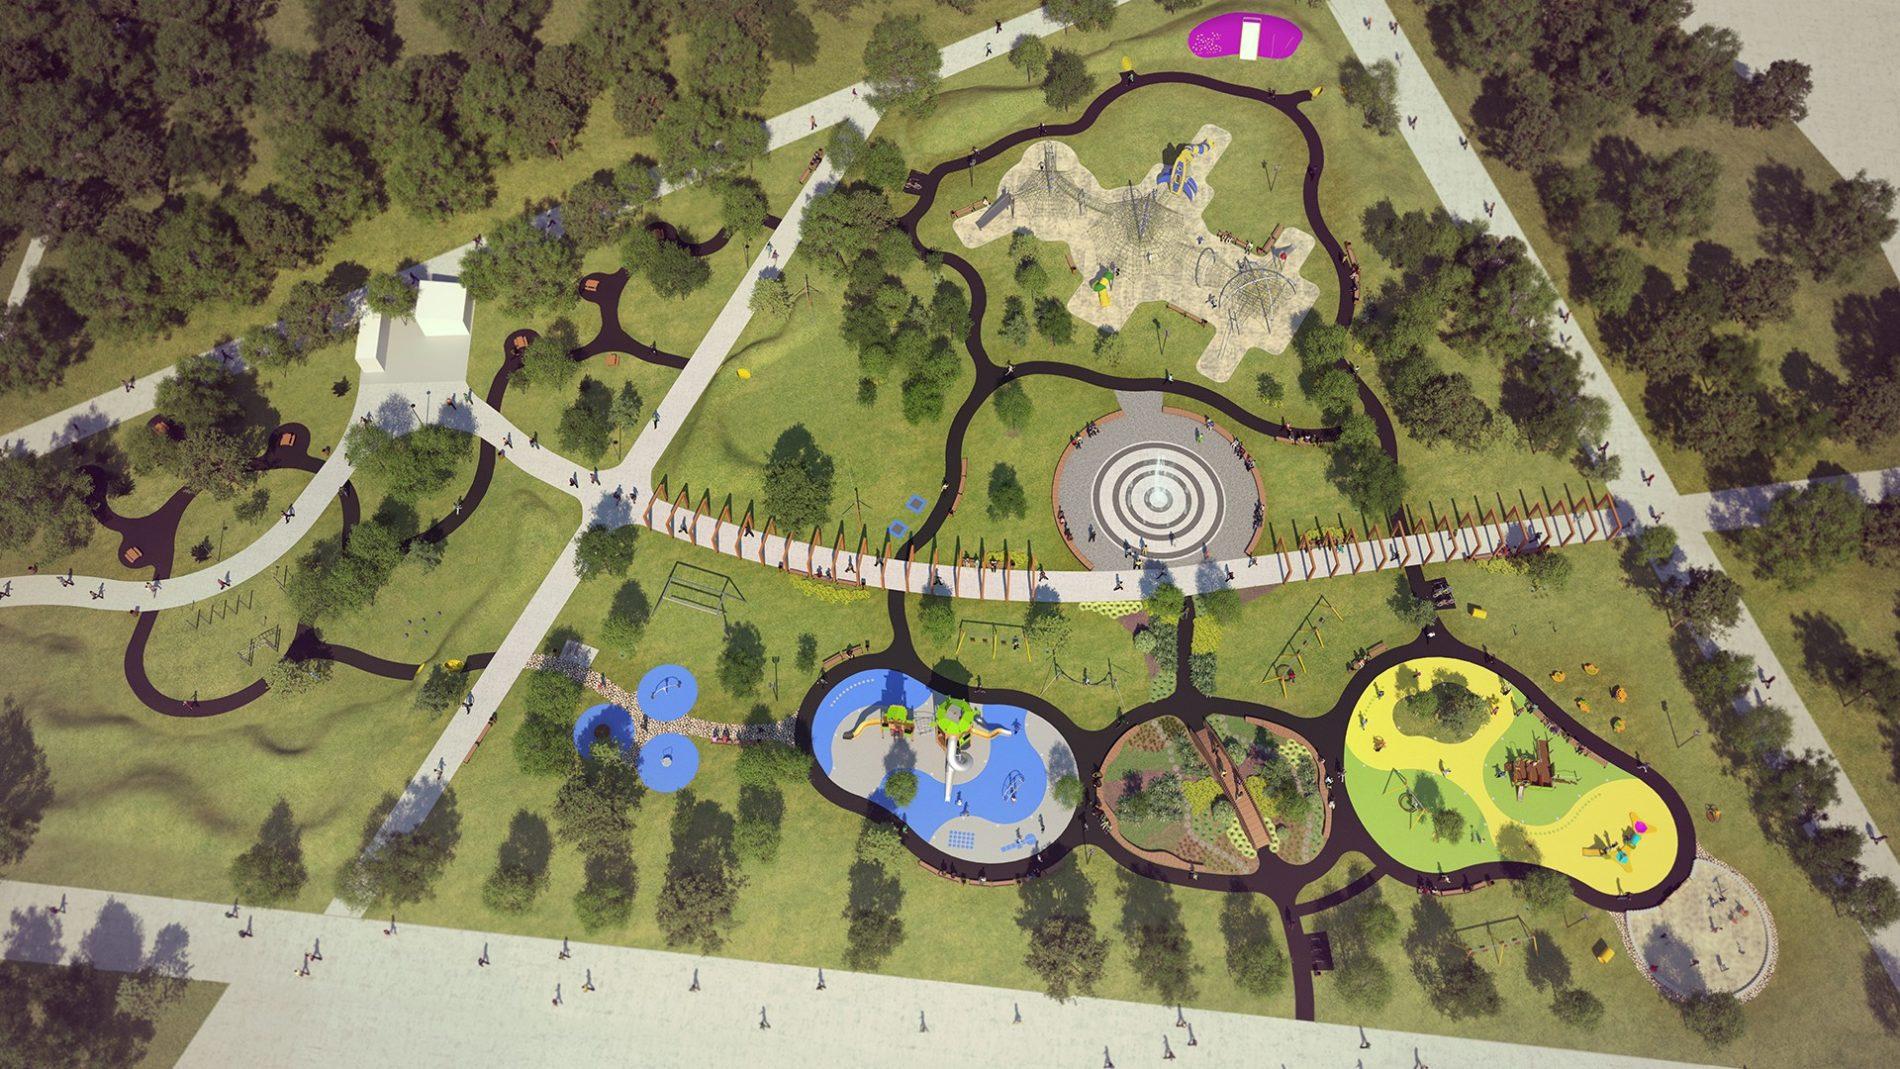 Ogród jordanowski prak kuronia Sosnowiec